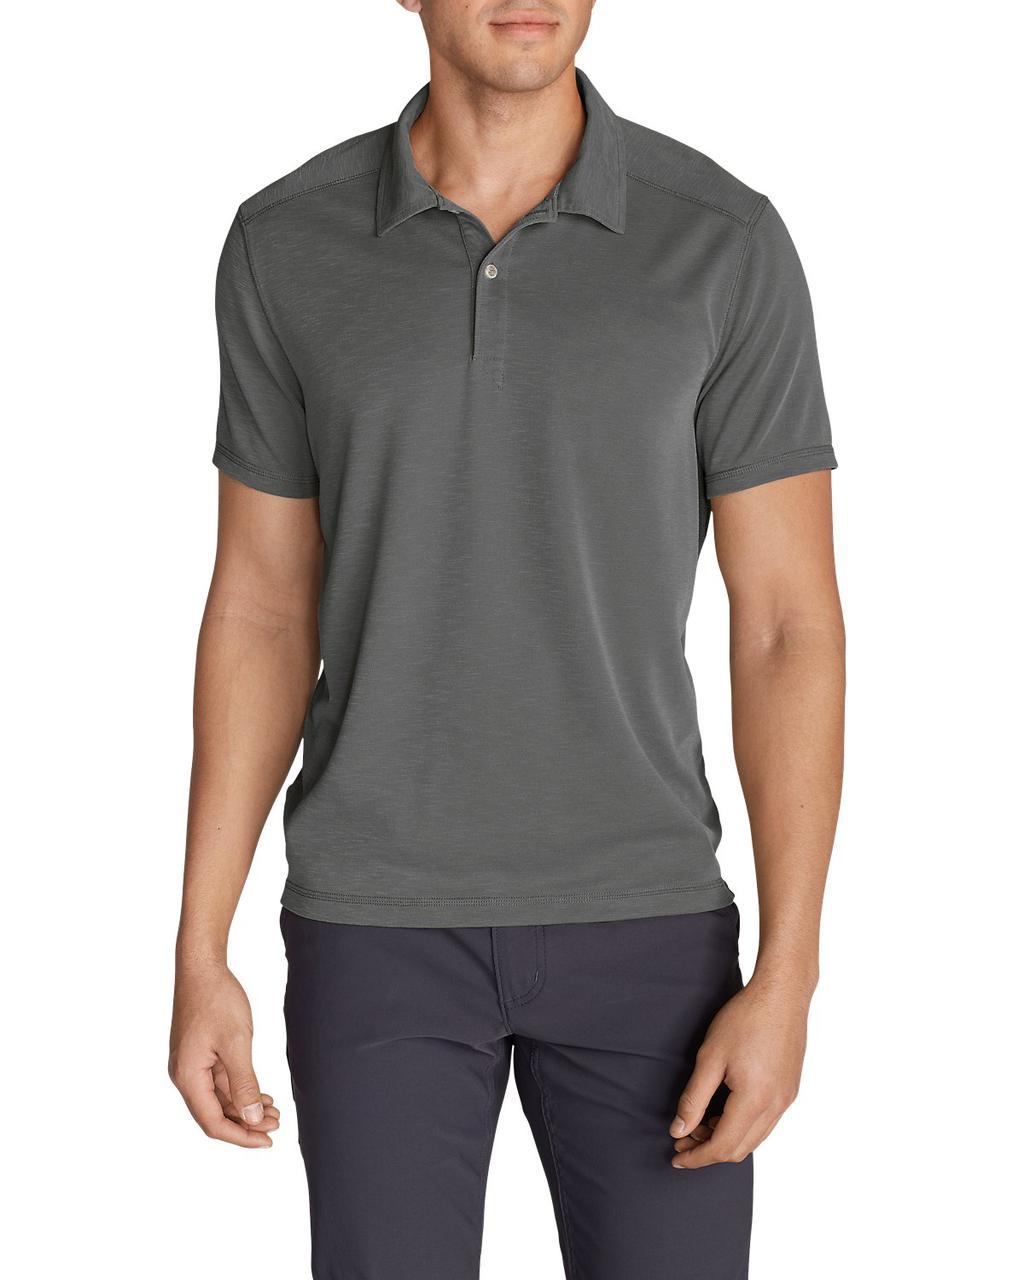 Поло рубашка Eddie Bauer Contour Performance Slub Polo Shirt M